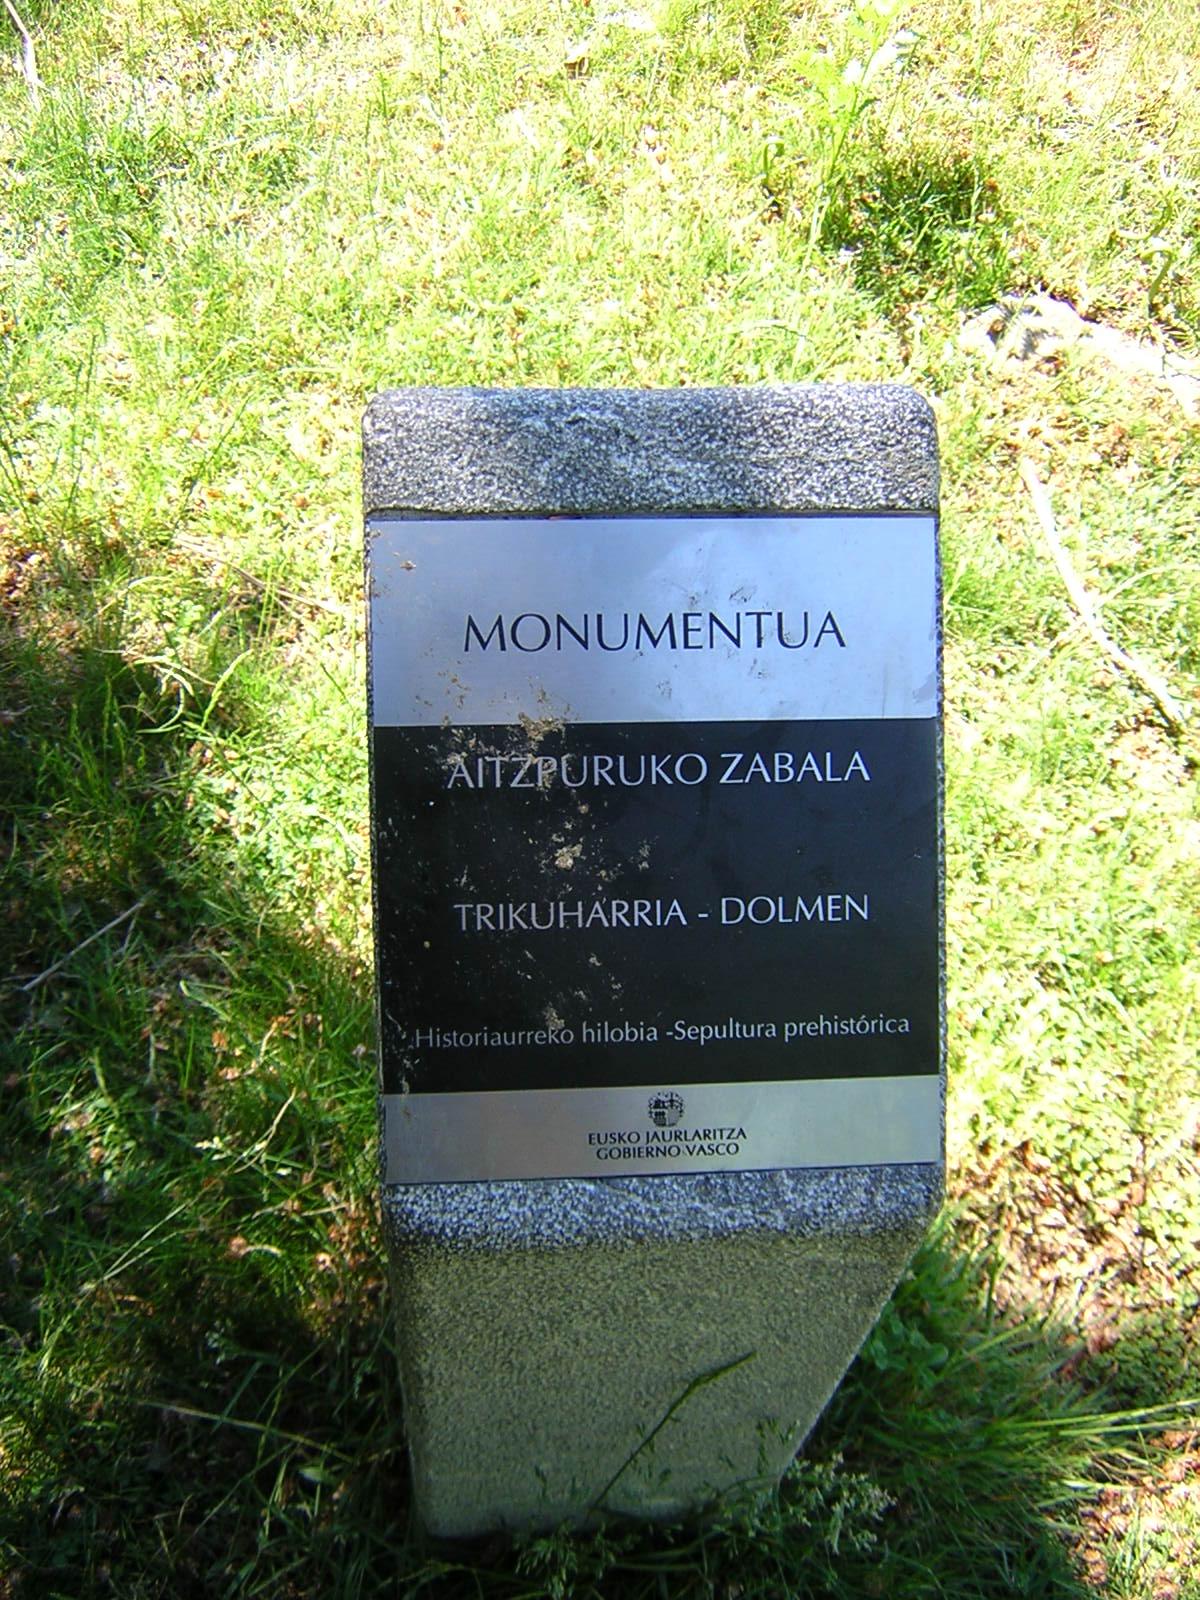 Dolmen Aitzpuruko zabala Trikuharria